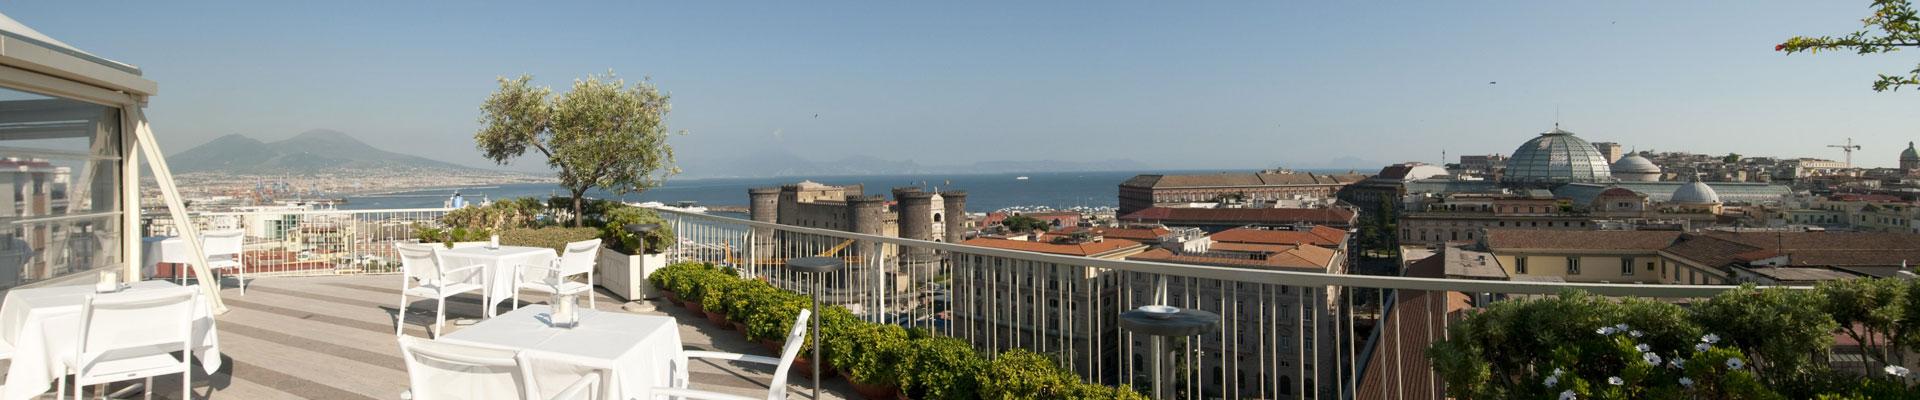 Marriott Napoli